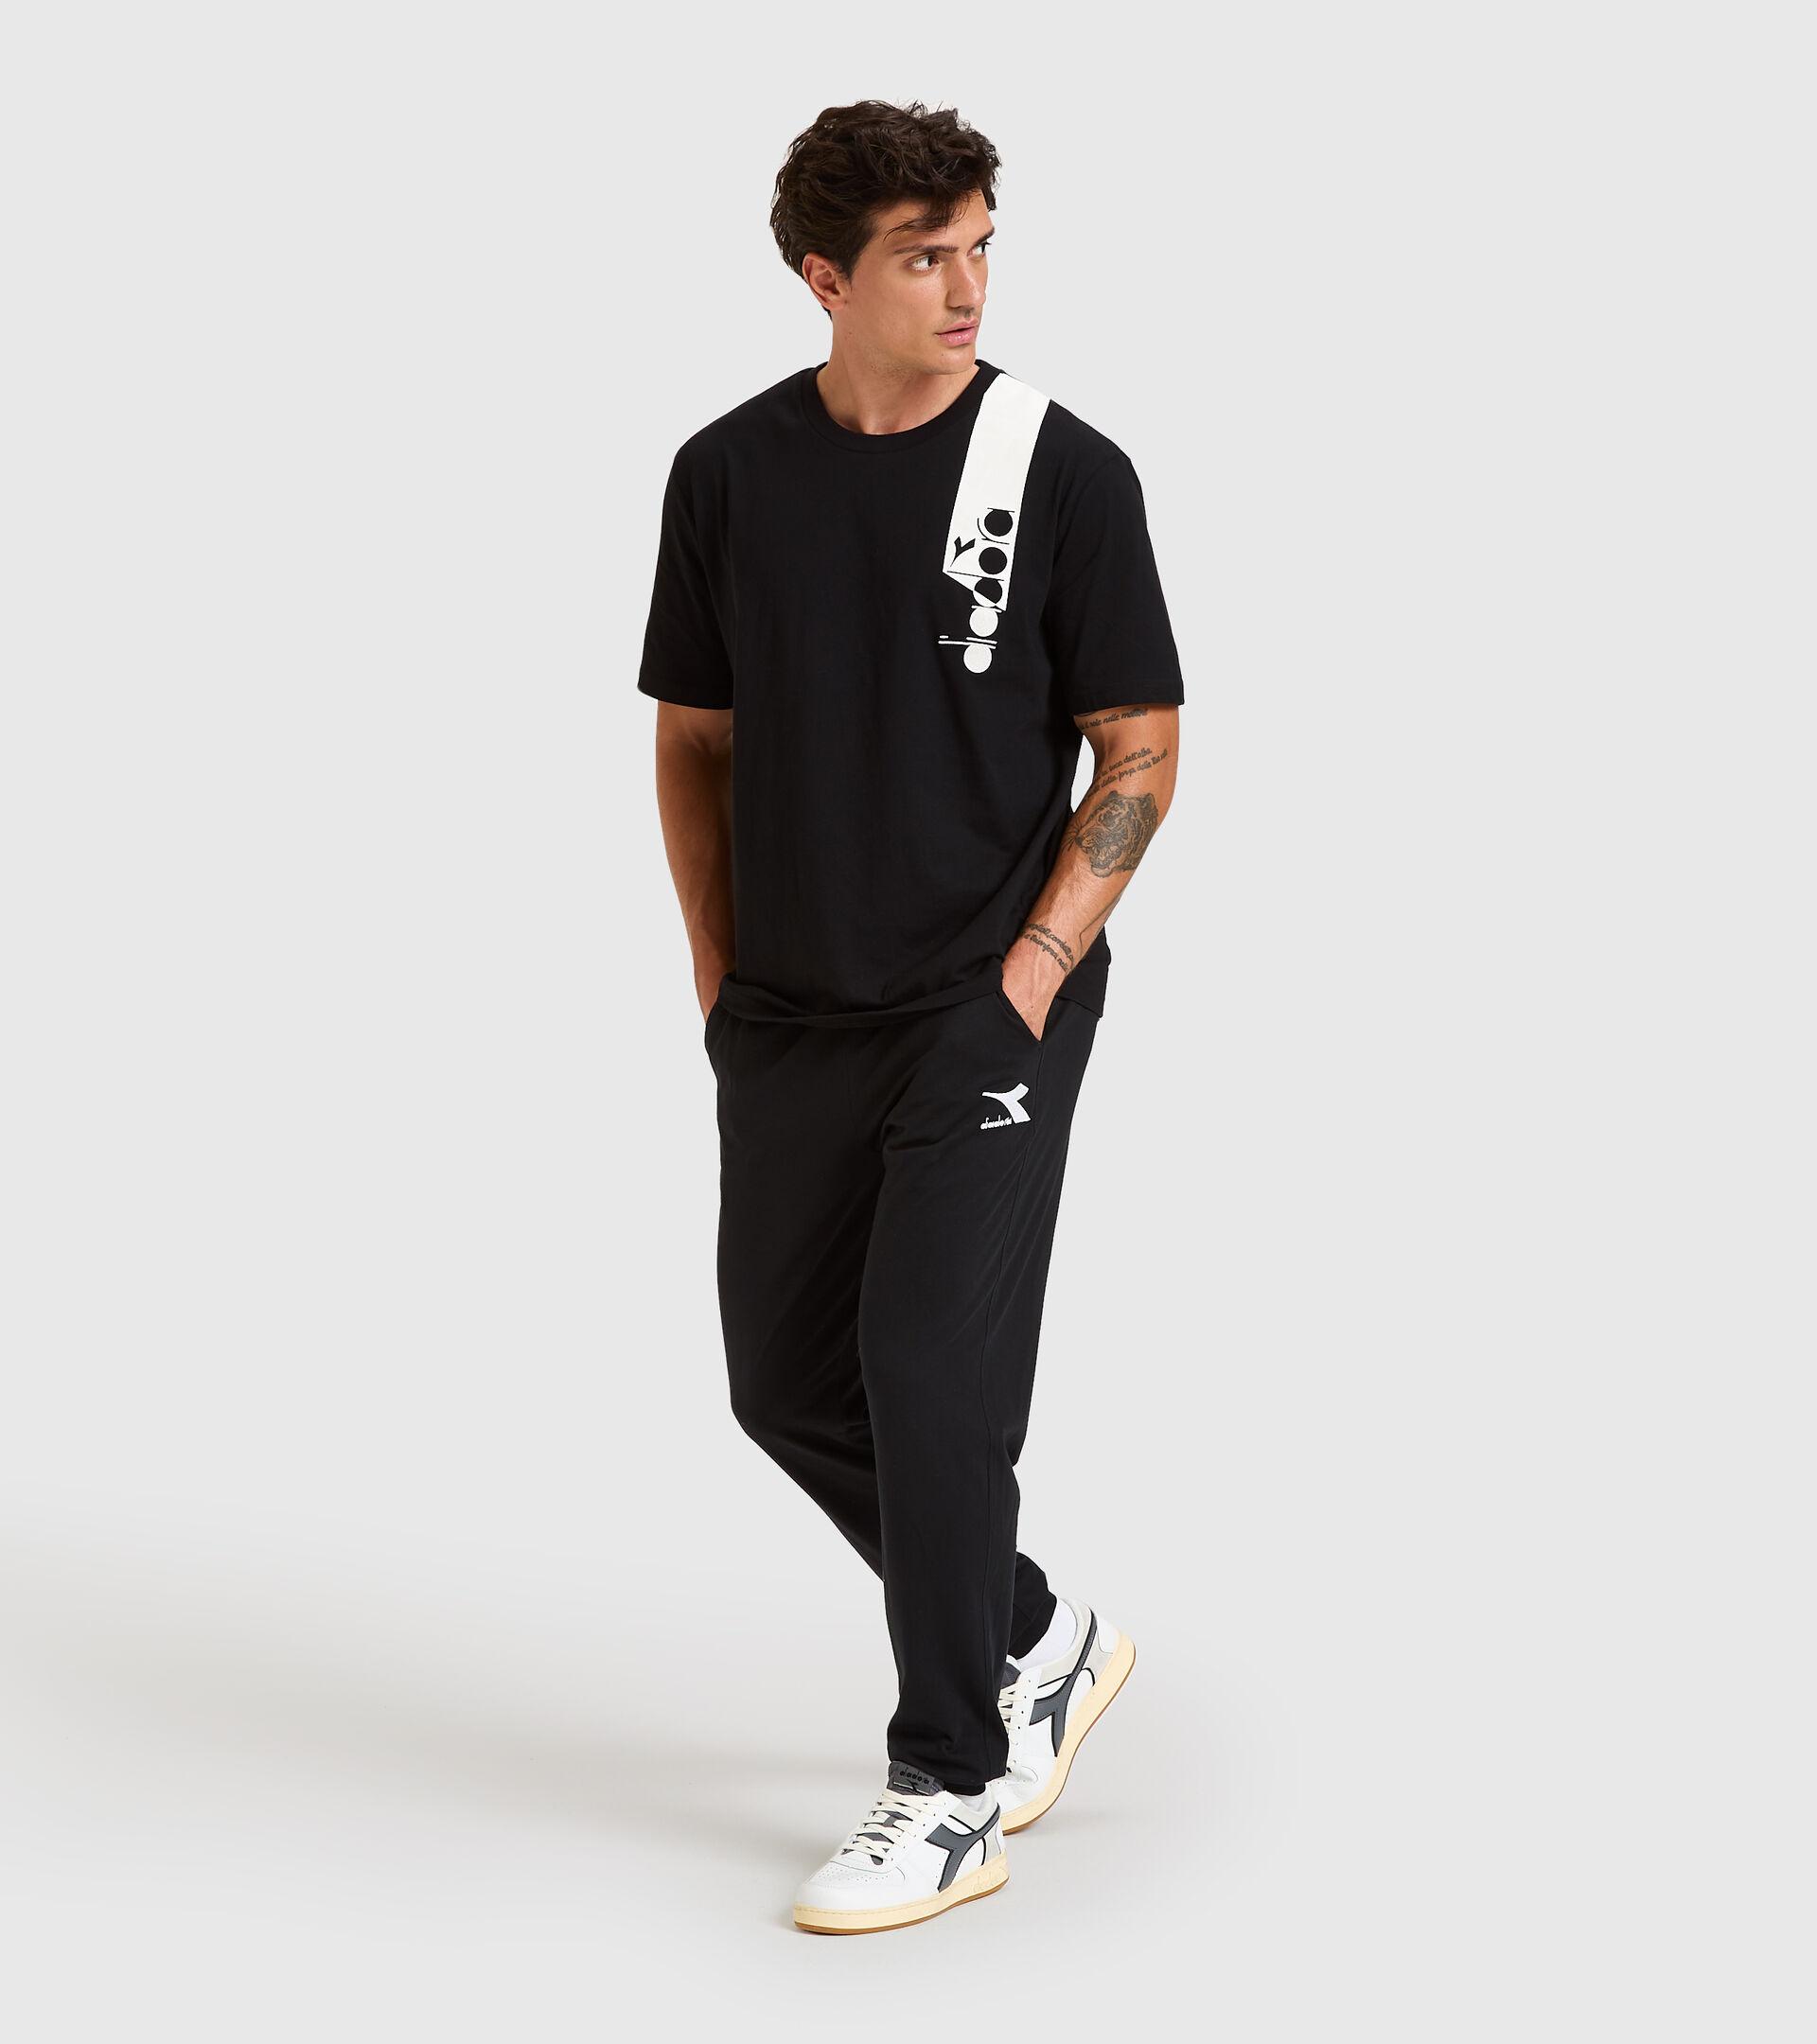 T-shirt - Unisex T-SHIRT SS ICON HIERRO NUEVE/BLANCO/AZUL FLUO - Diadora